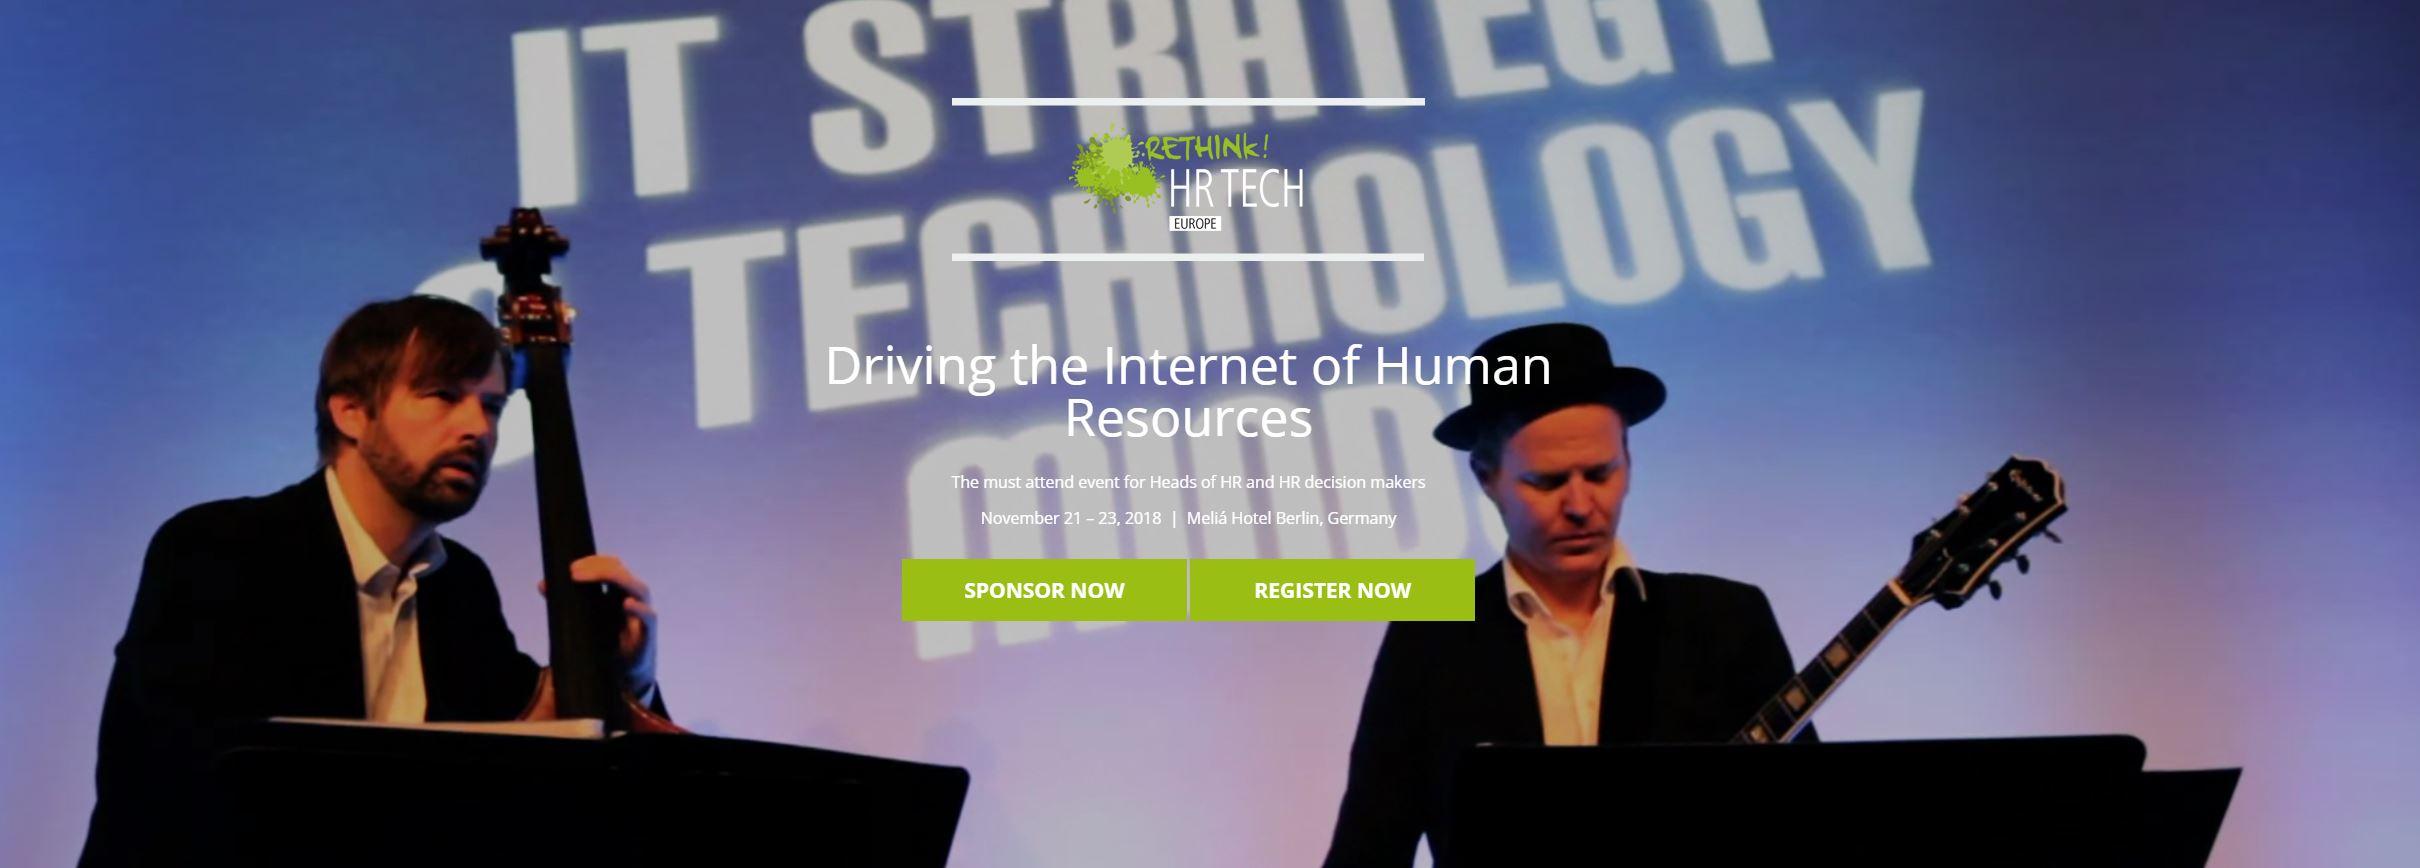 Rethink HR Tech Europe